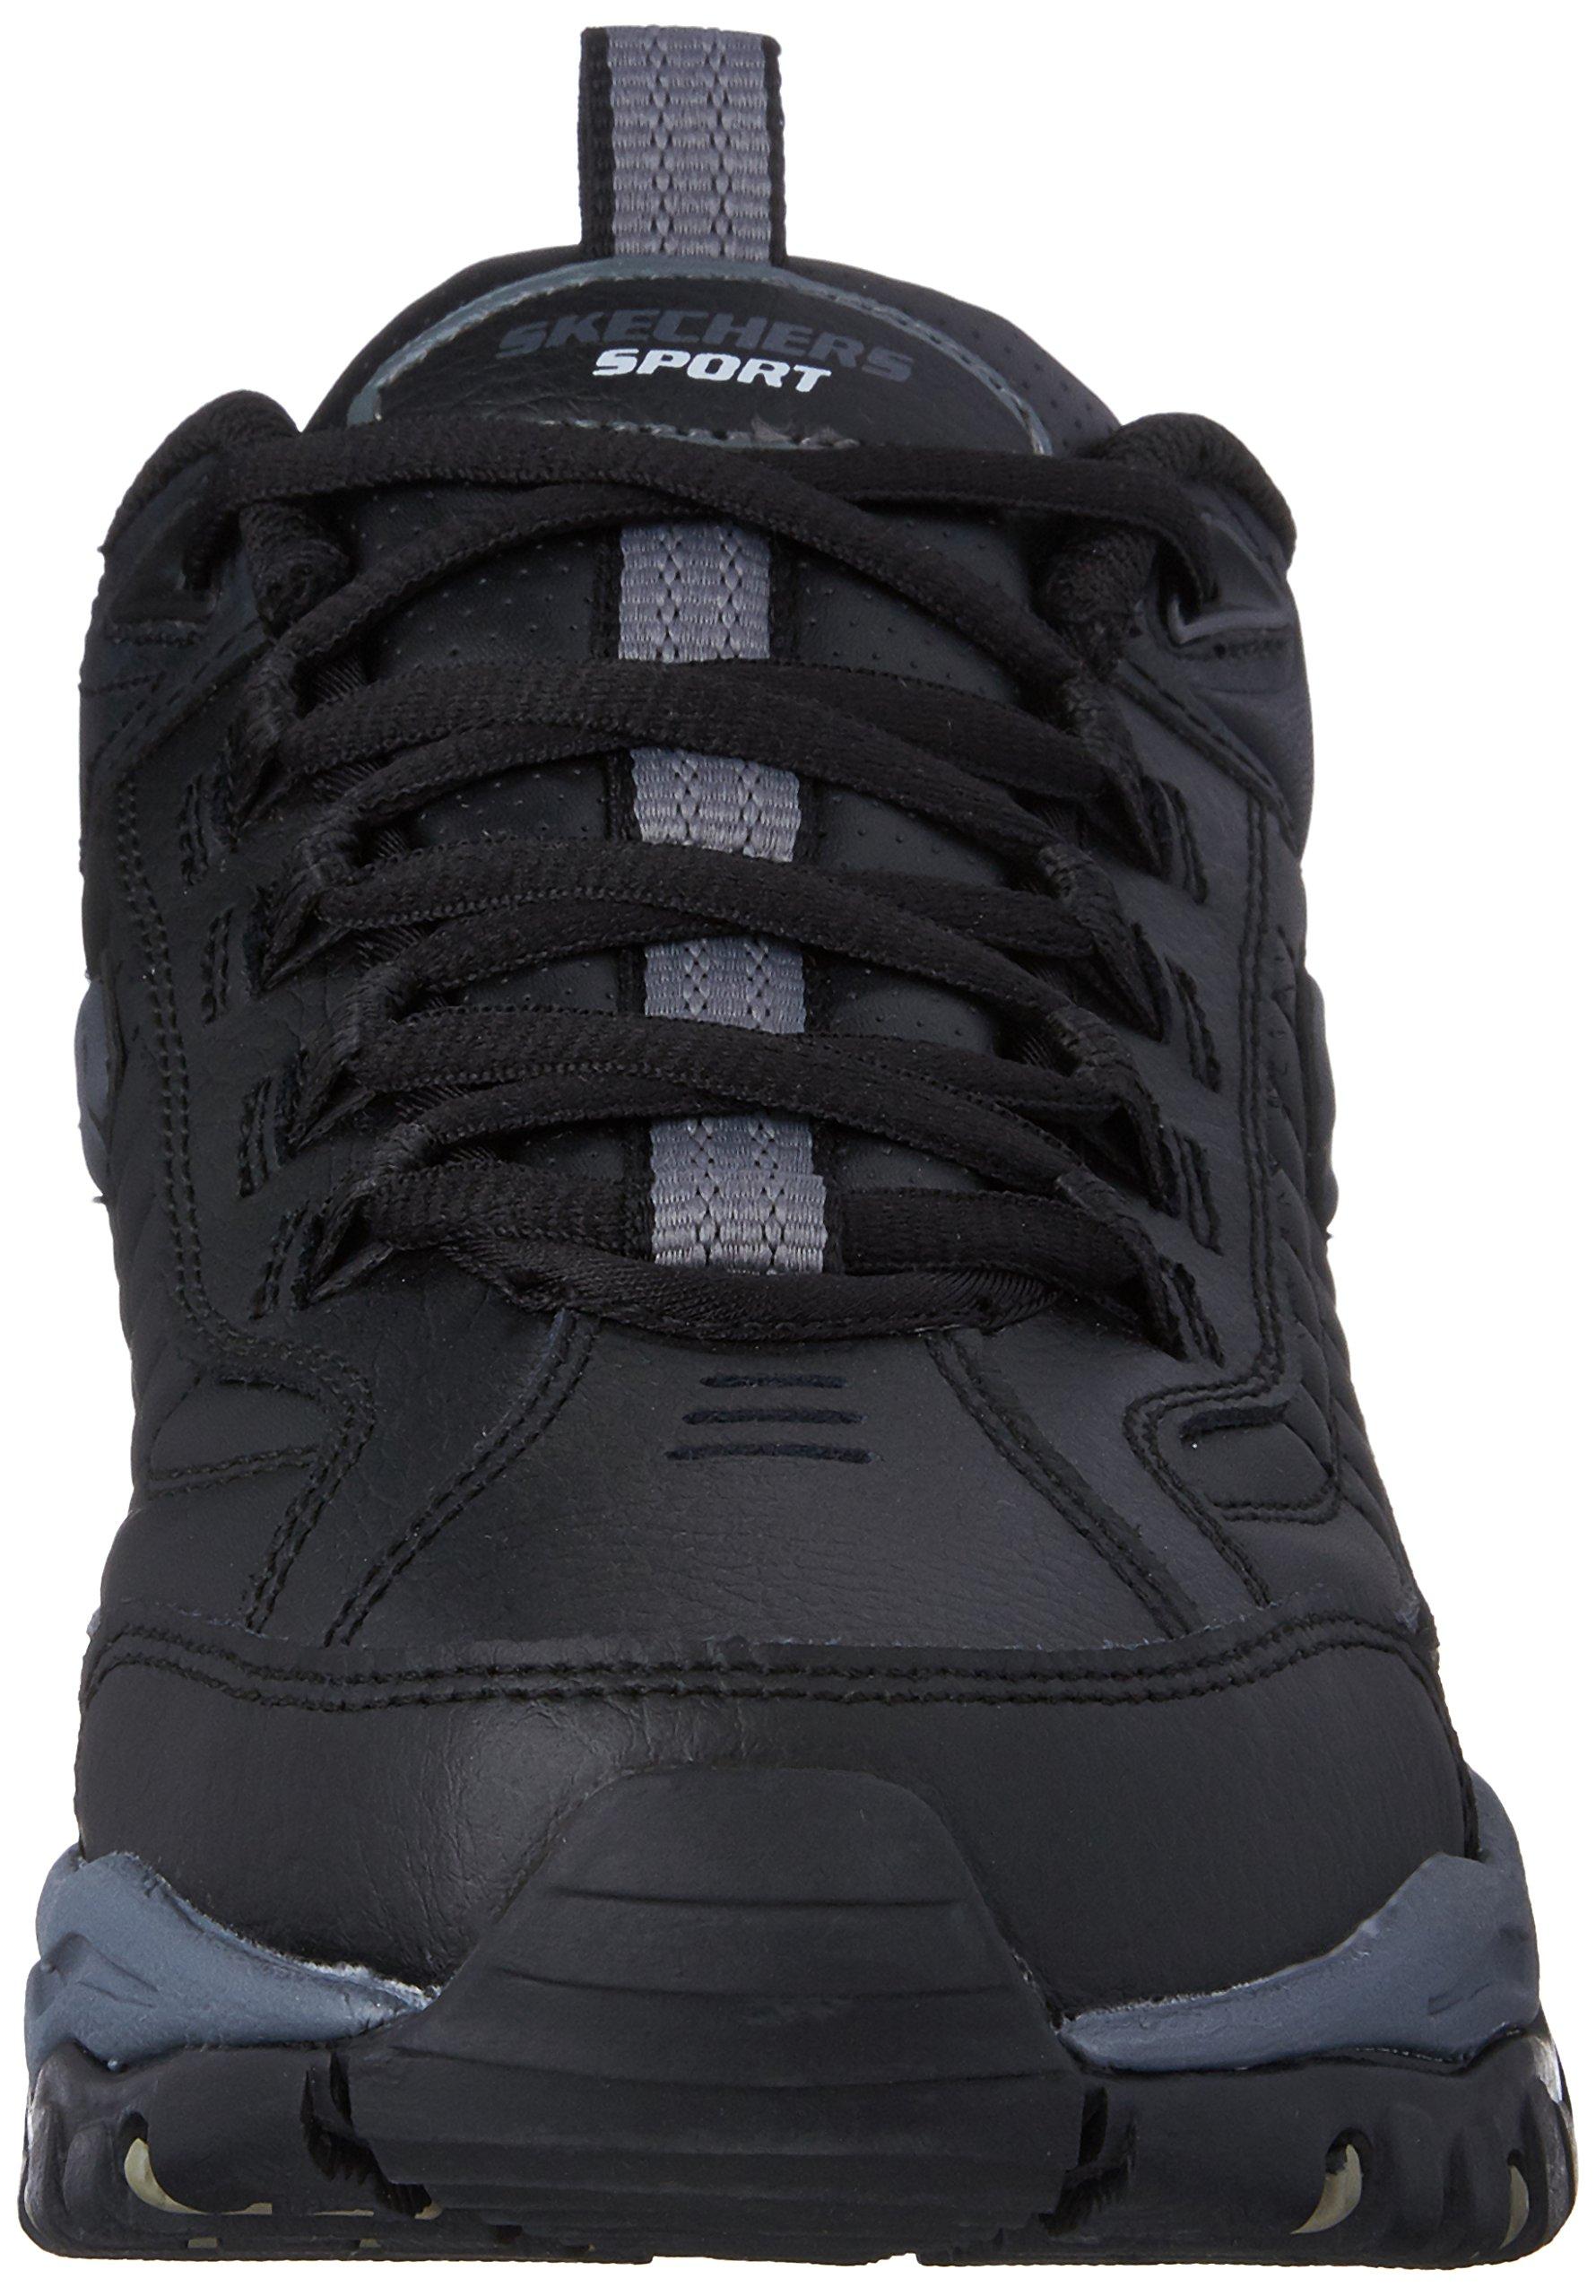 Skechers Men's Energy Afterburn Lace-Up Sneaker,Black/Gray,14 M US by Skechers (Image #4)